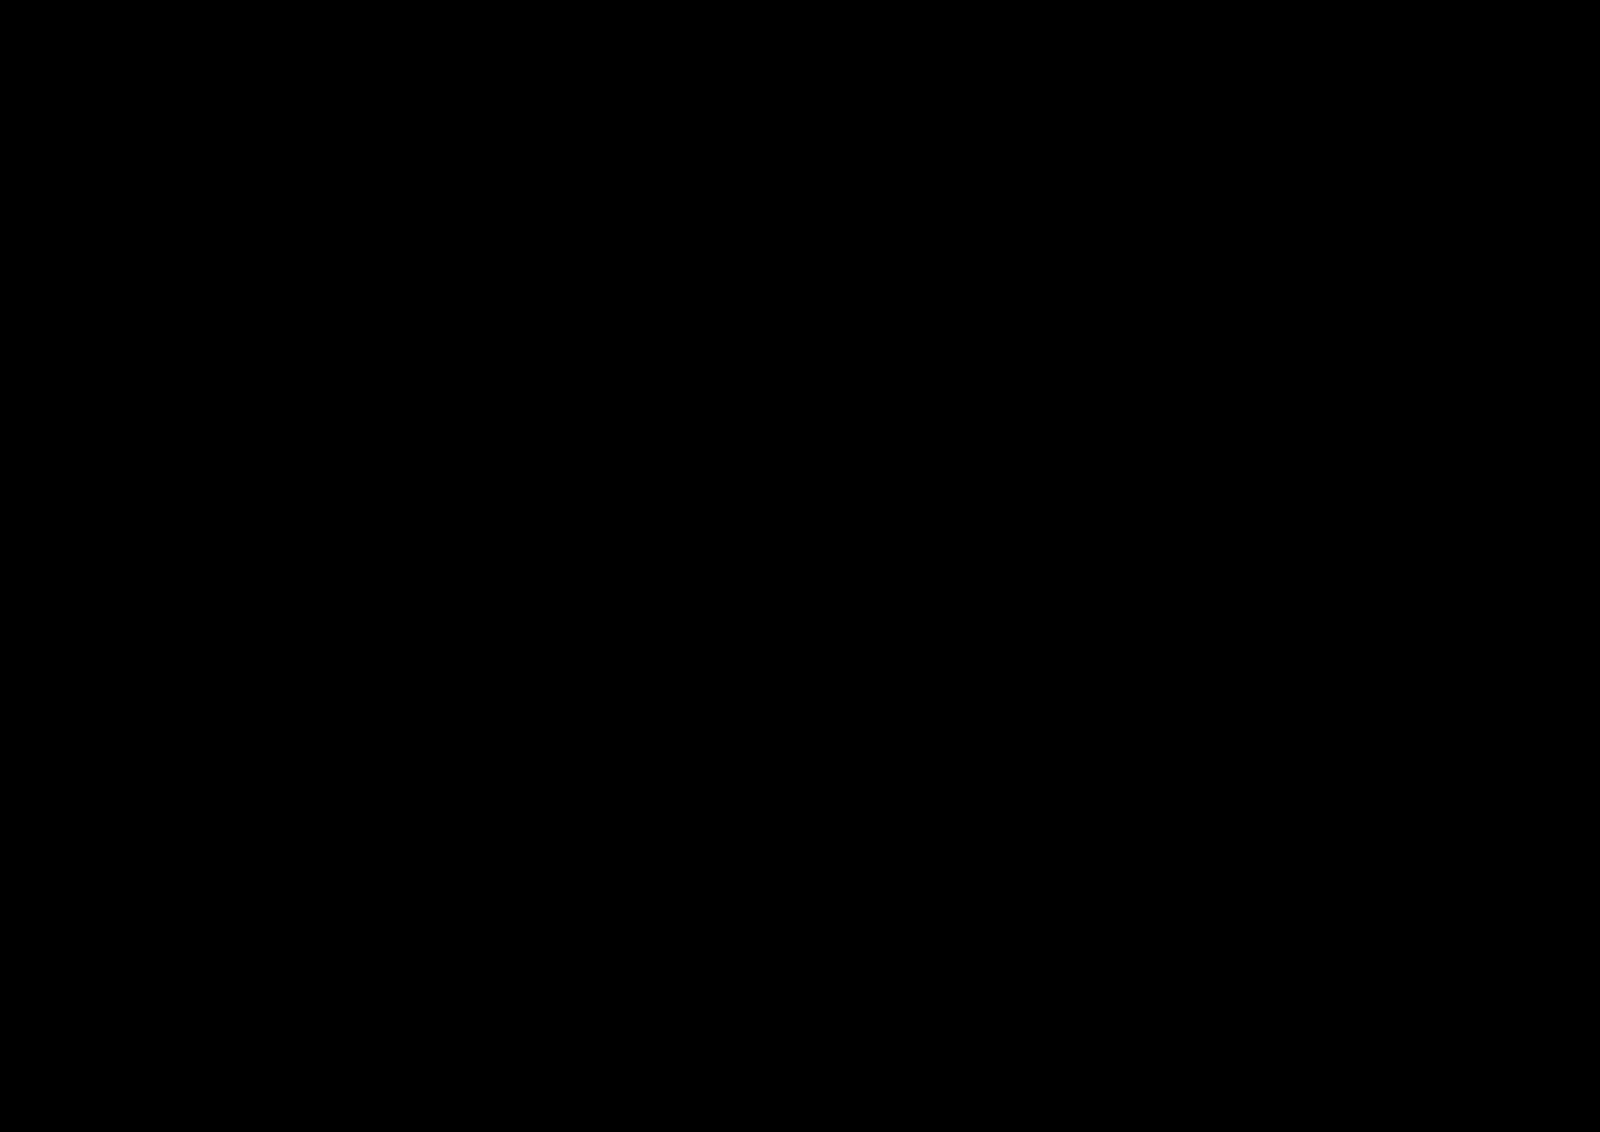 Atividade Letras do Alfabeto Flash Cards